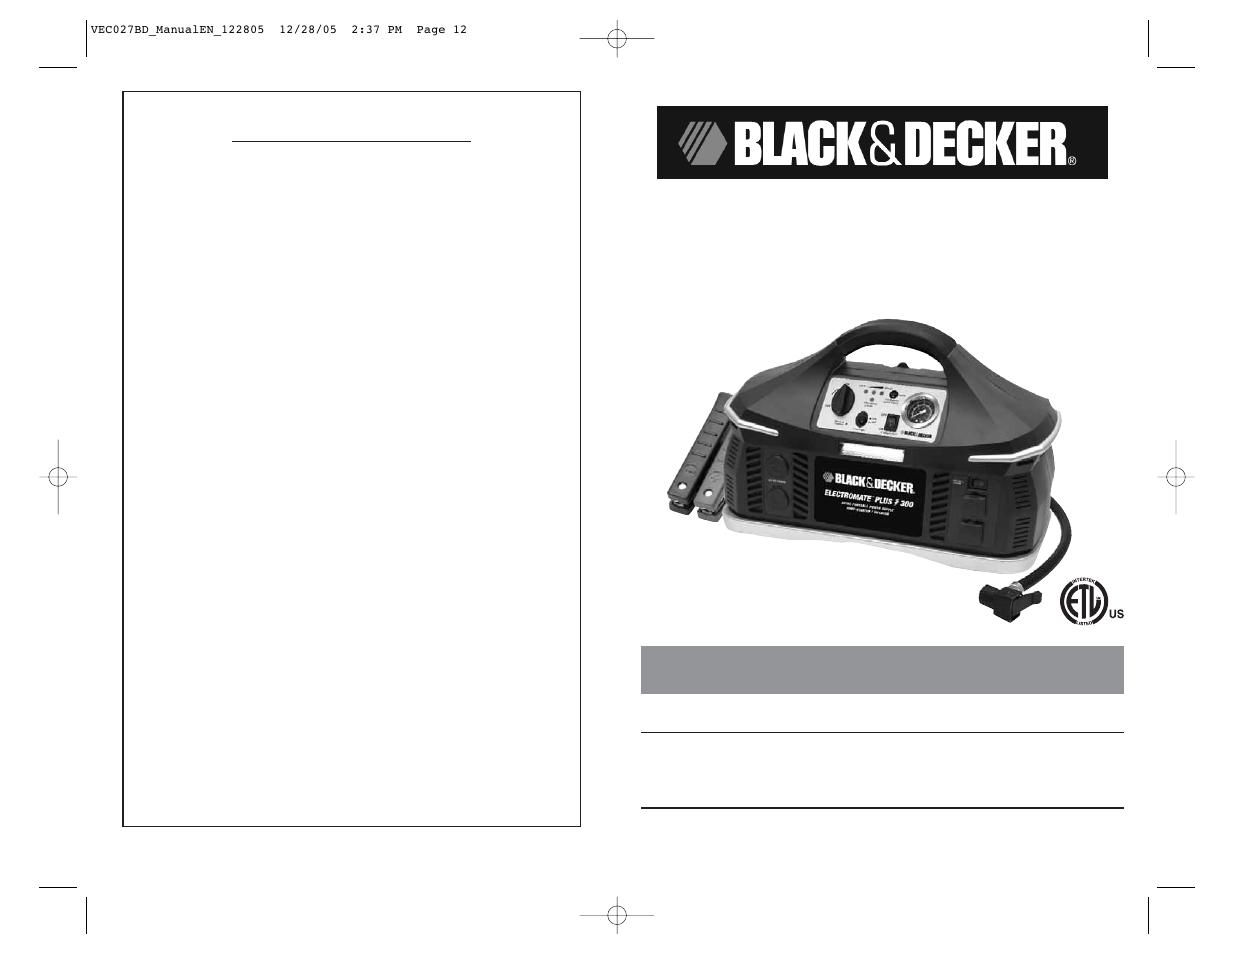 black decker customer service